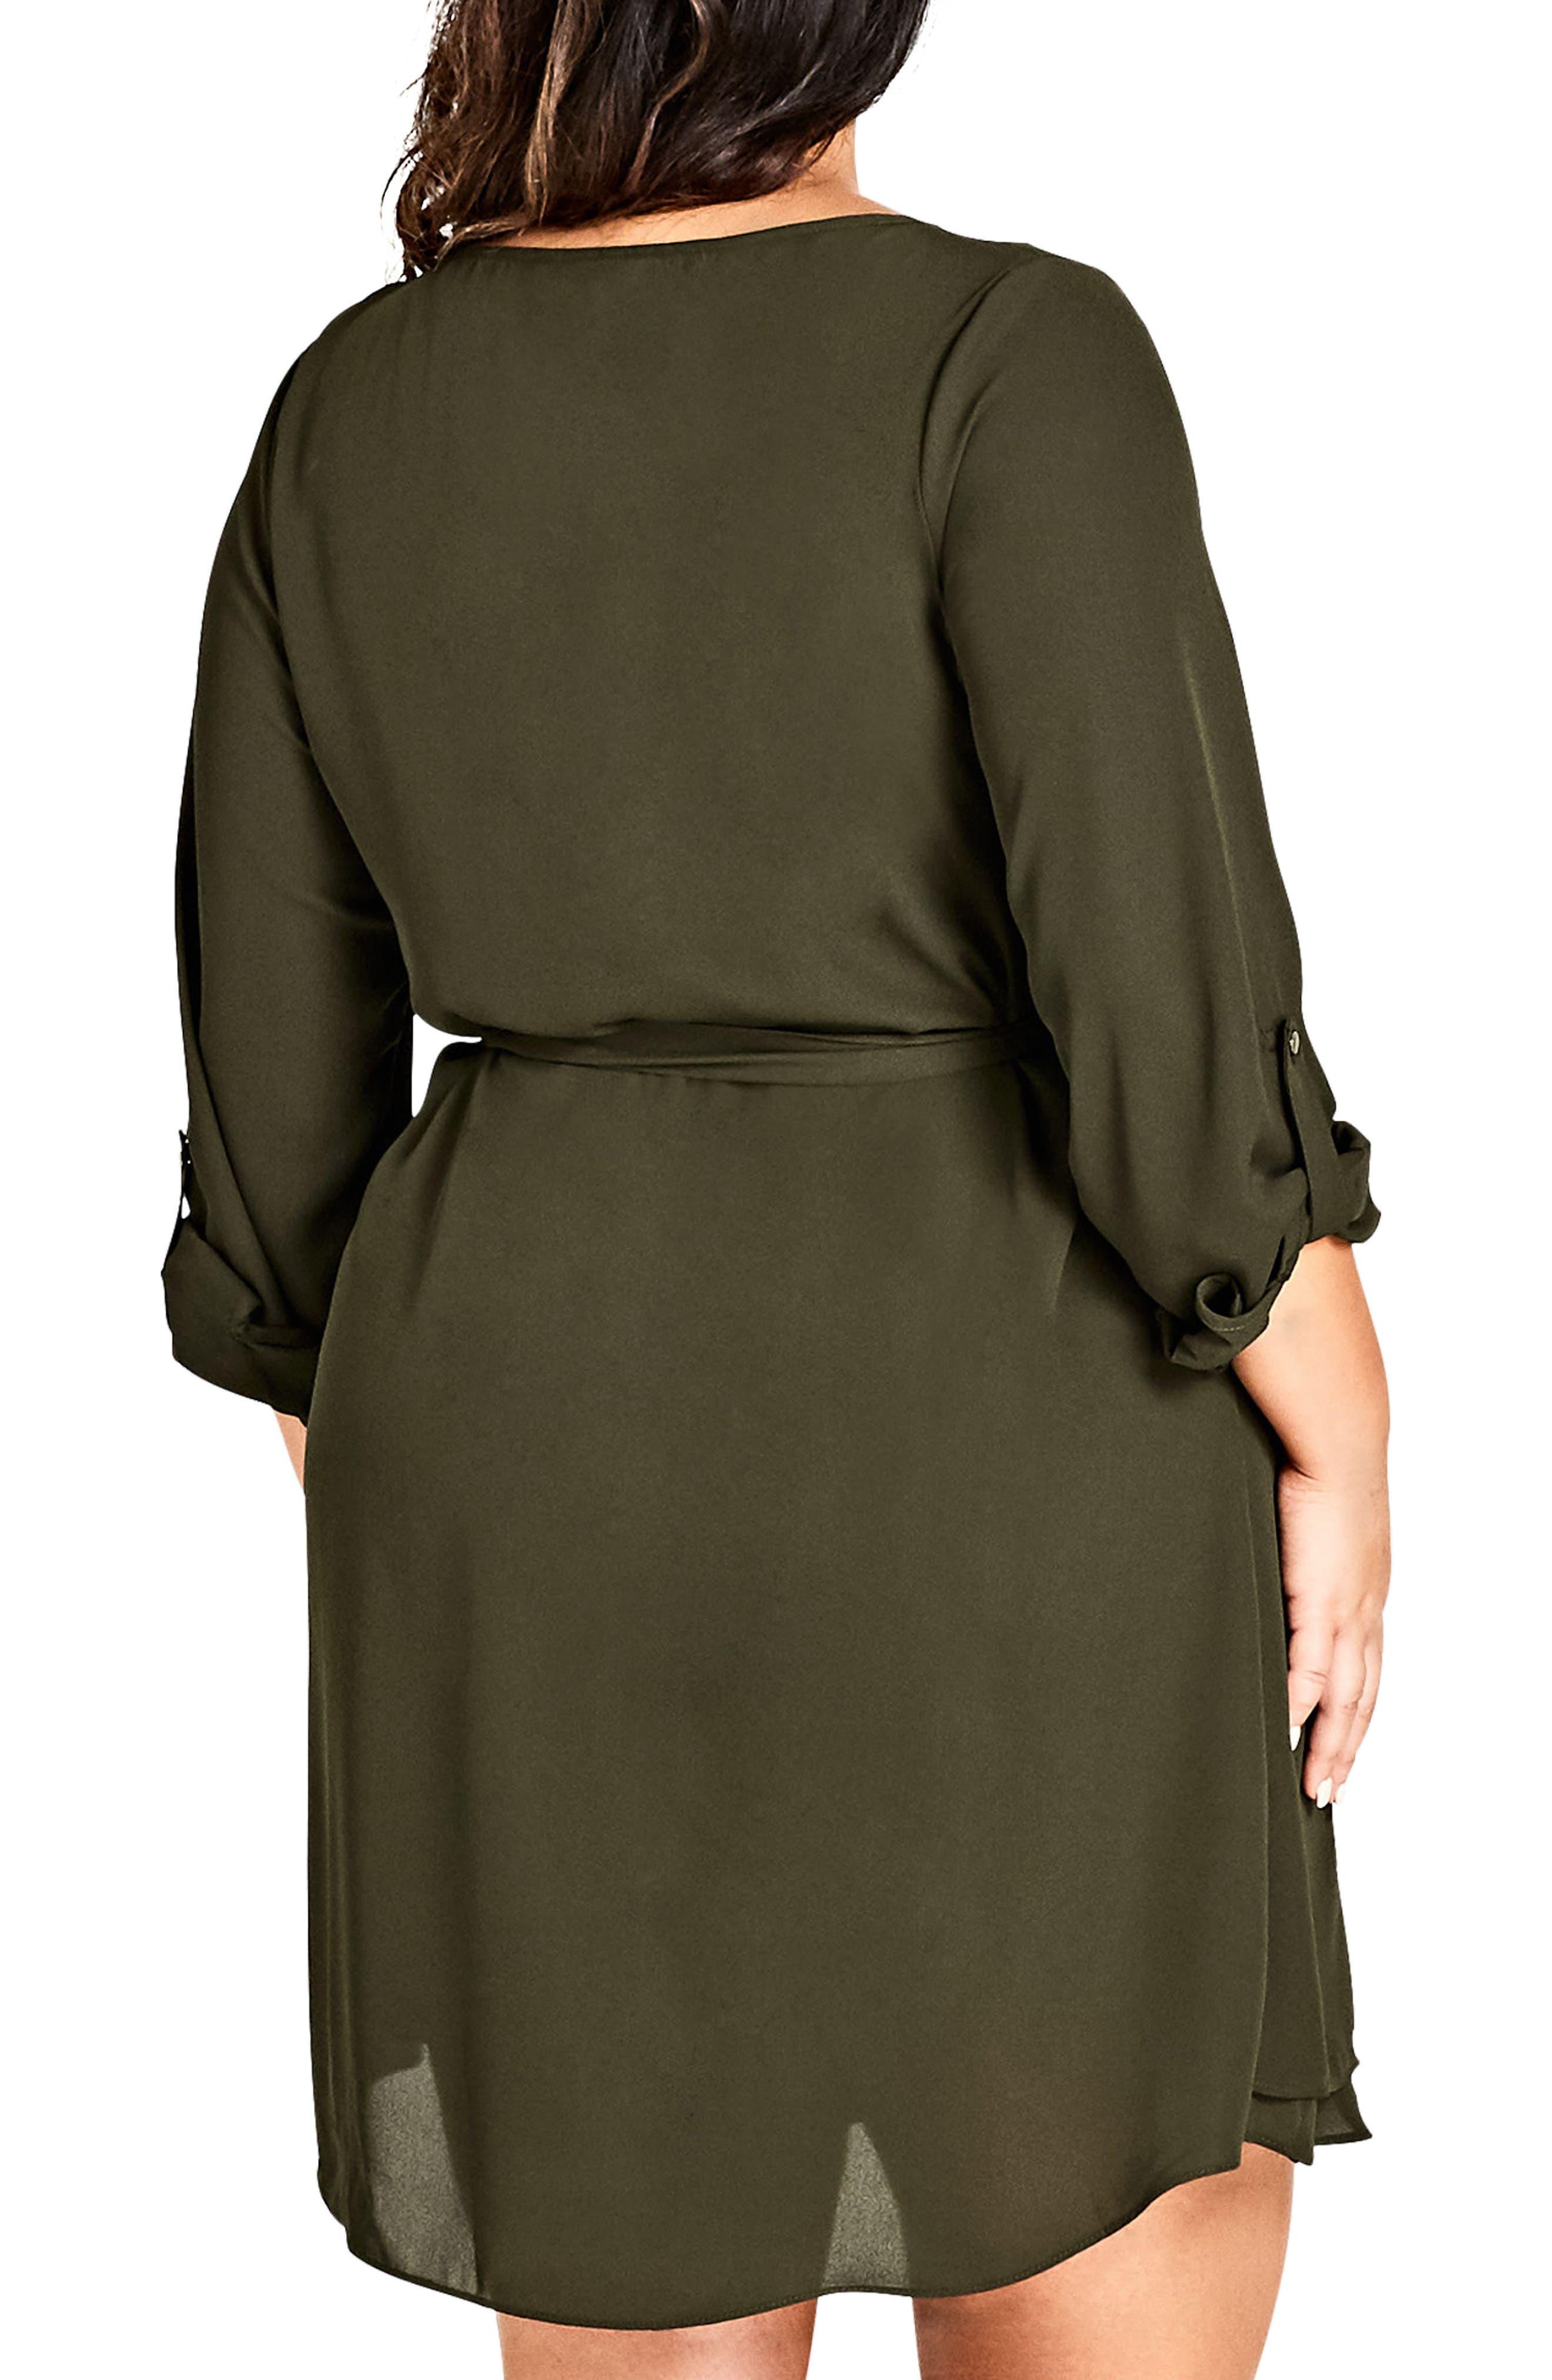 Zip Tunic Dress,                             Alternate thumbnail 2, color,                             311